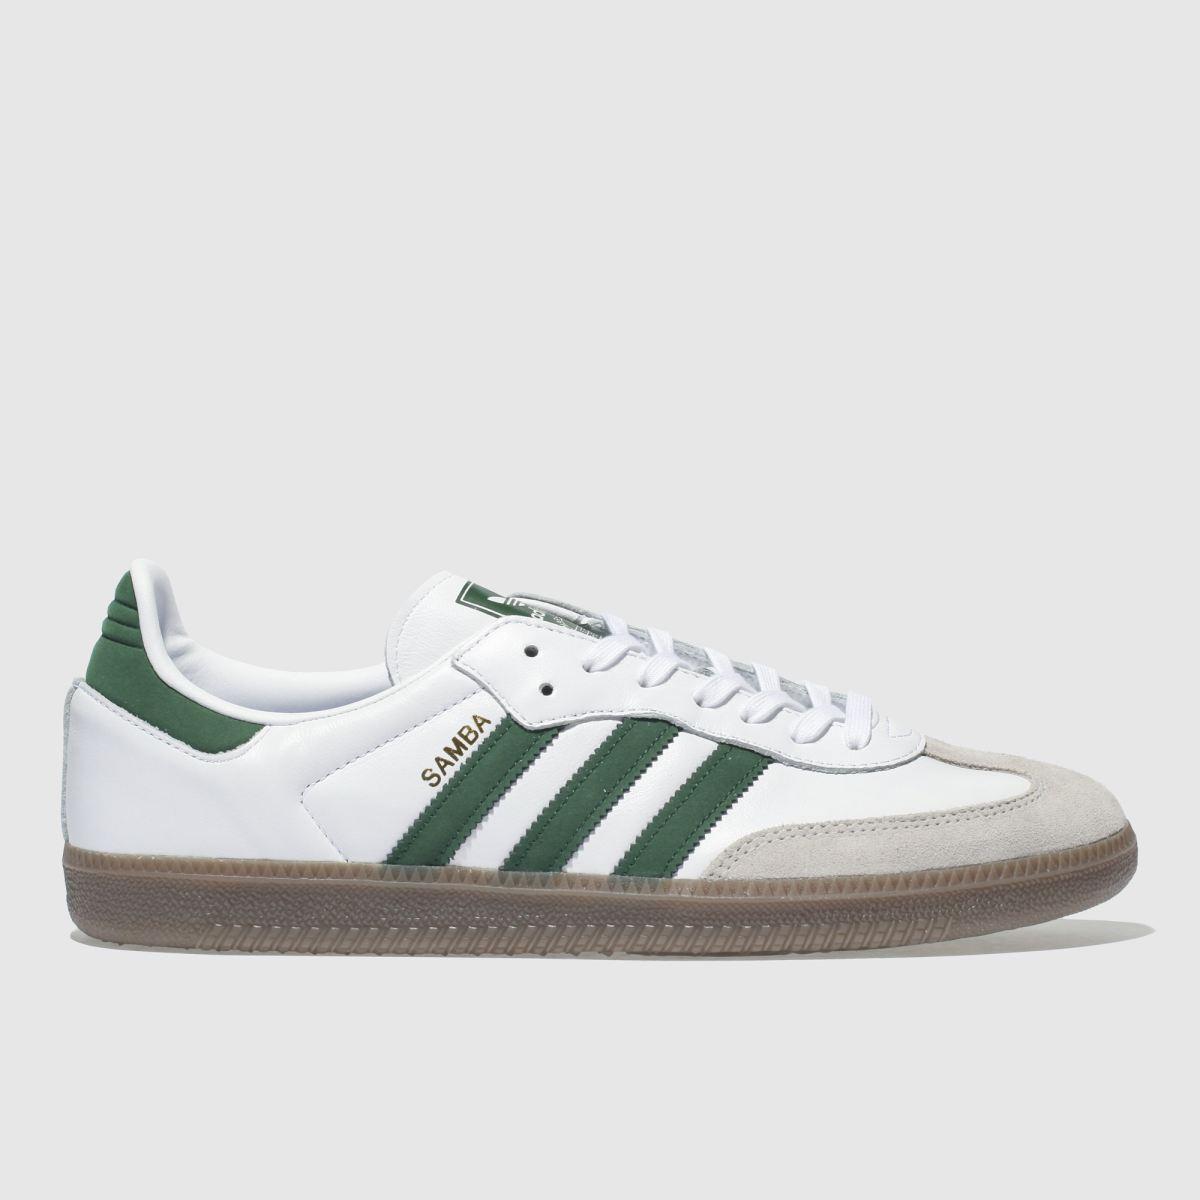 Adidas White & Green Samba Og Trainers